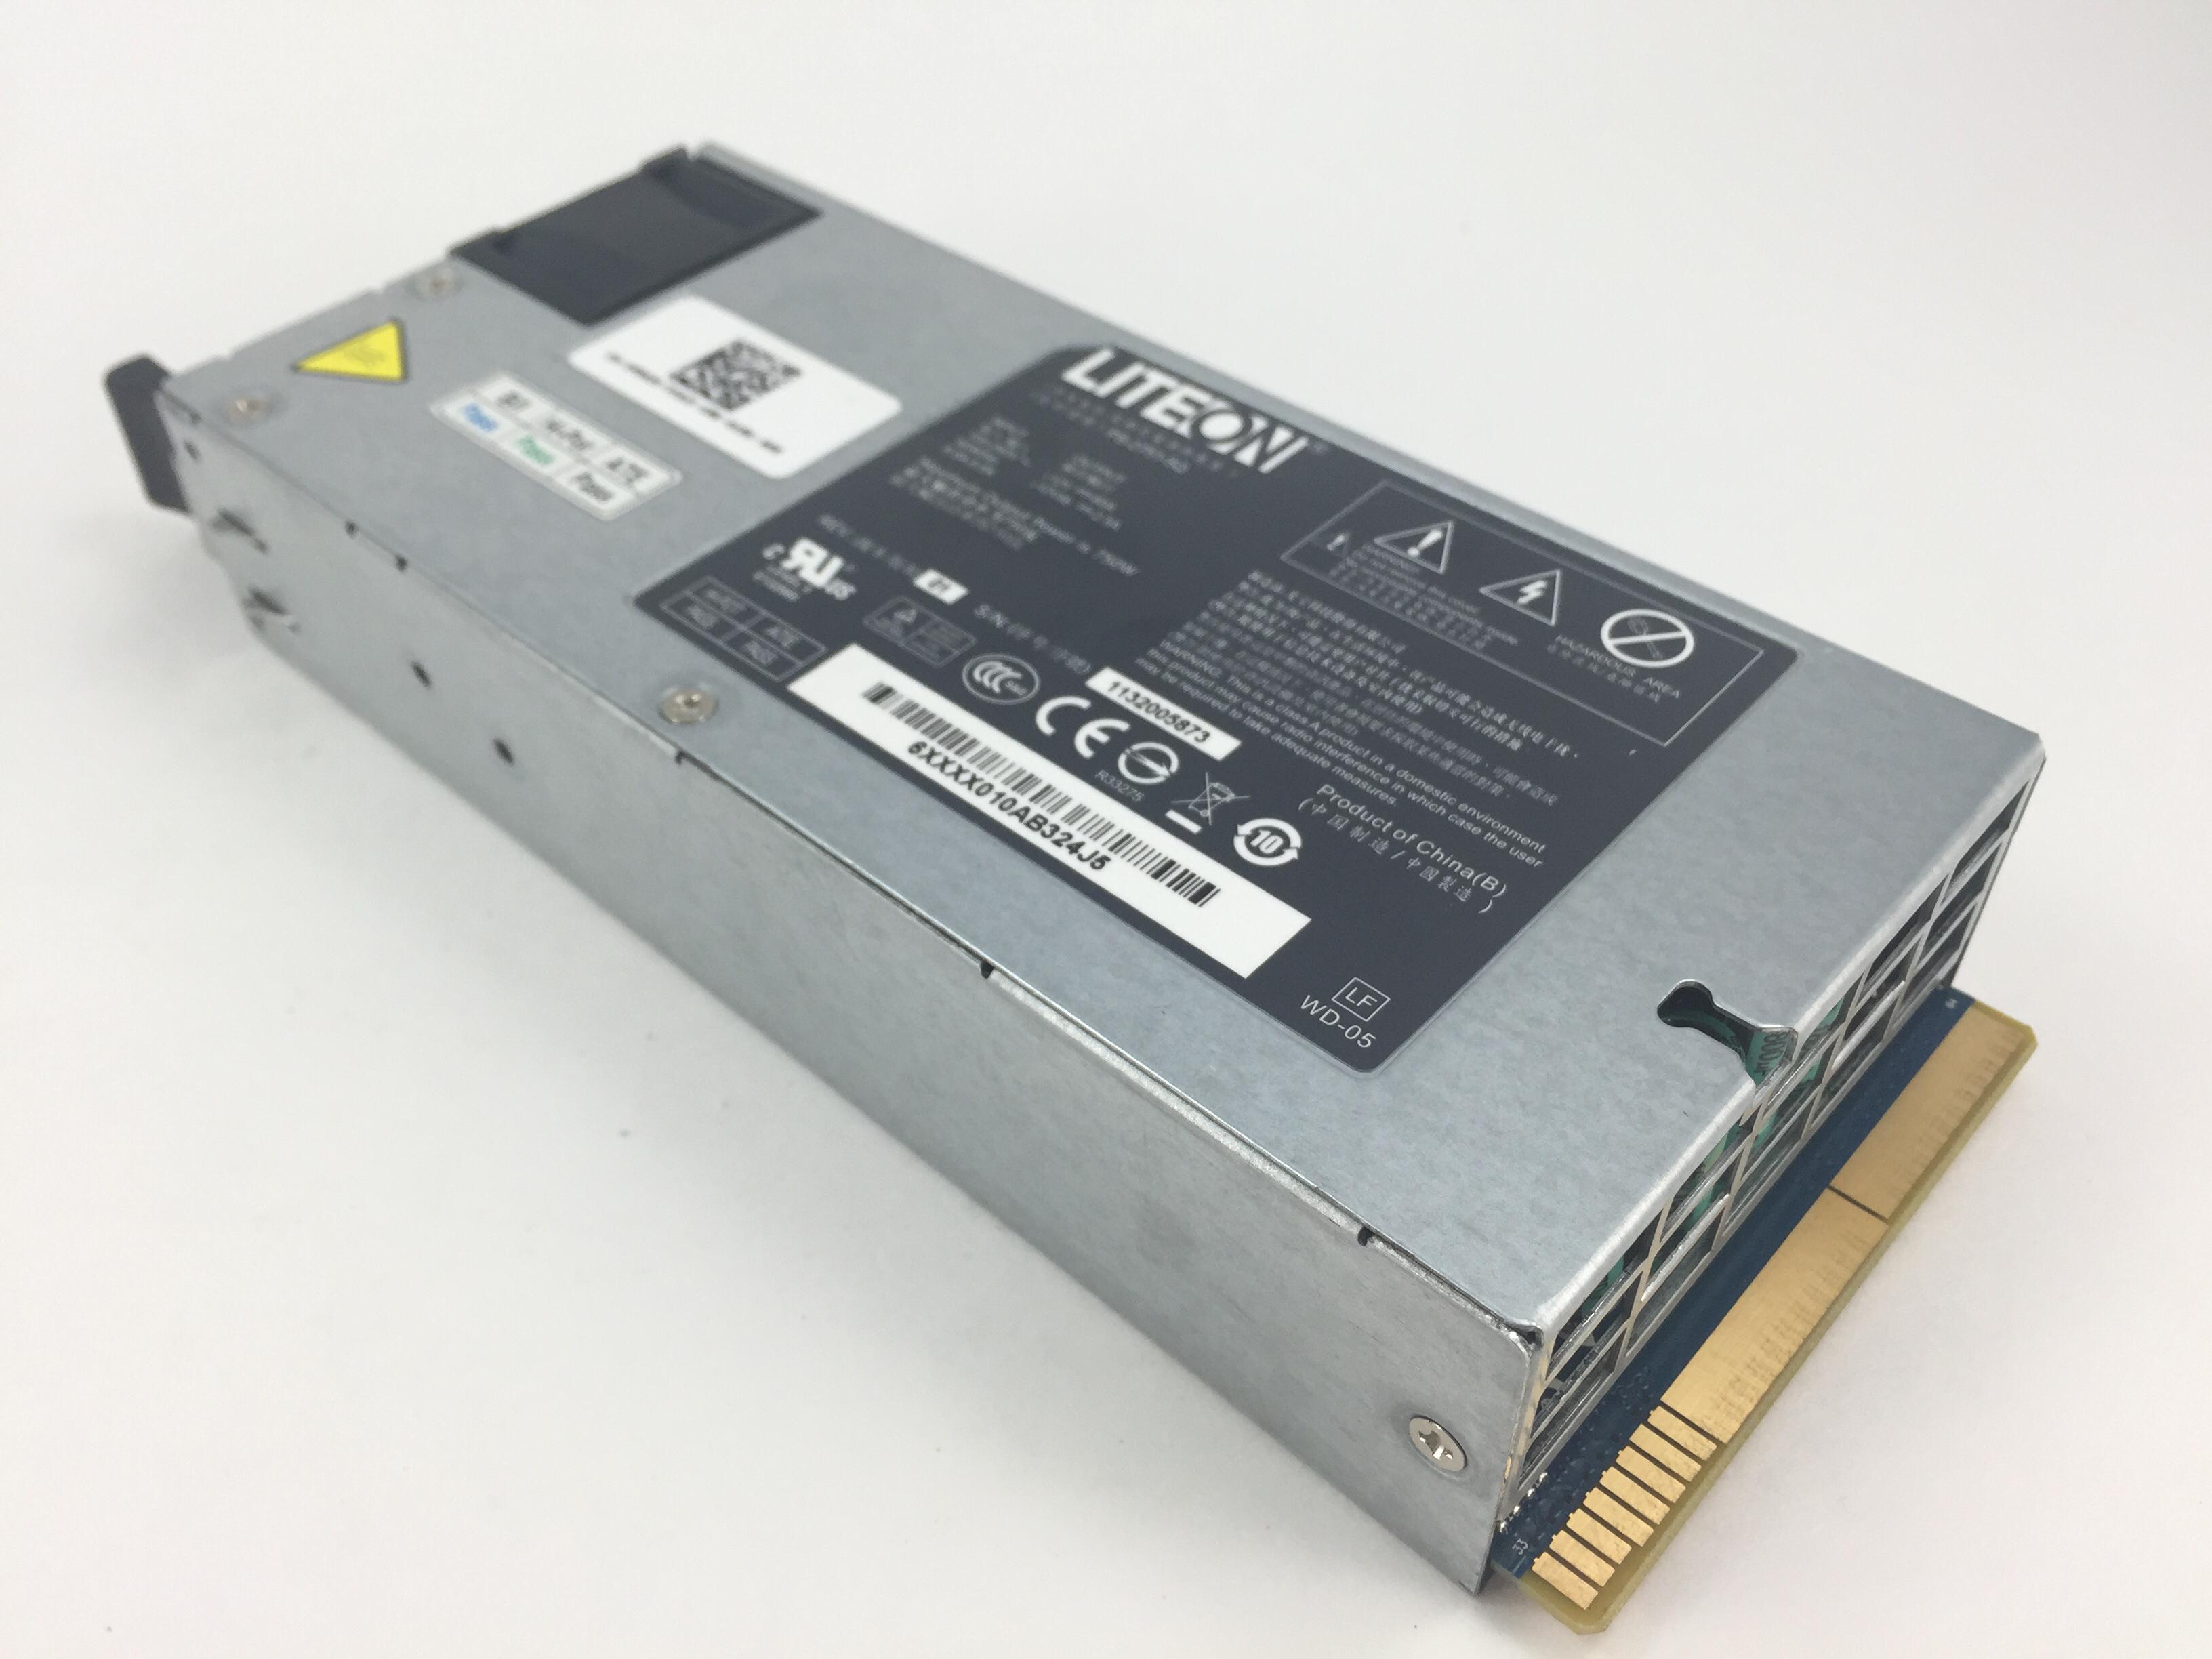 Dell Liteon  PowerEdge C2100 750W Redundant Power Supply (F3R29)